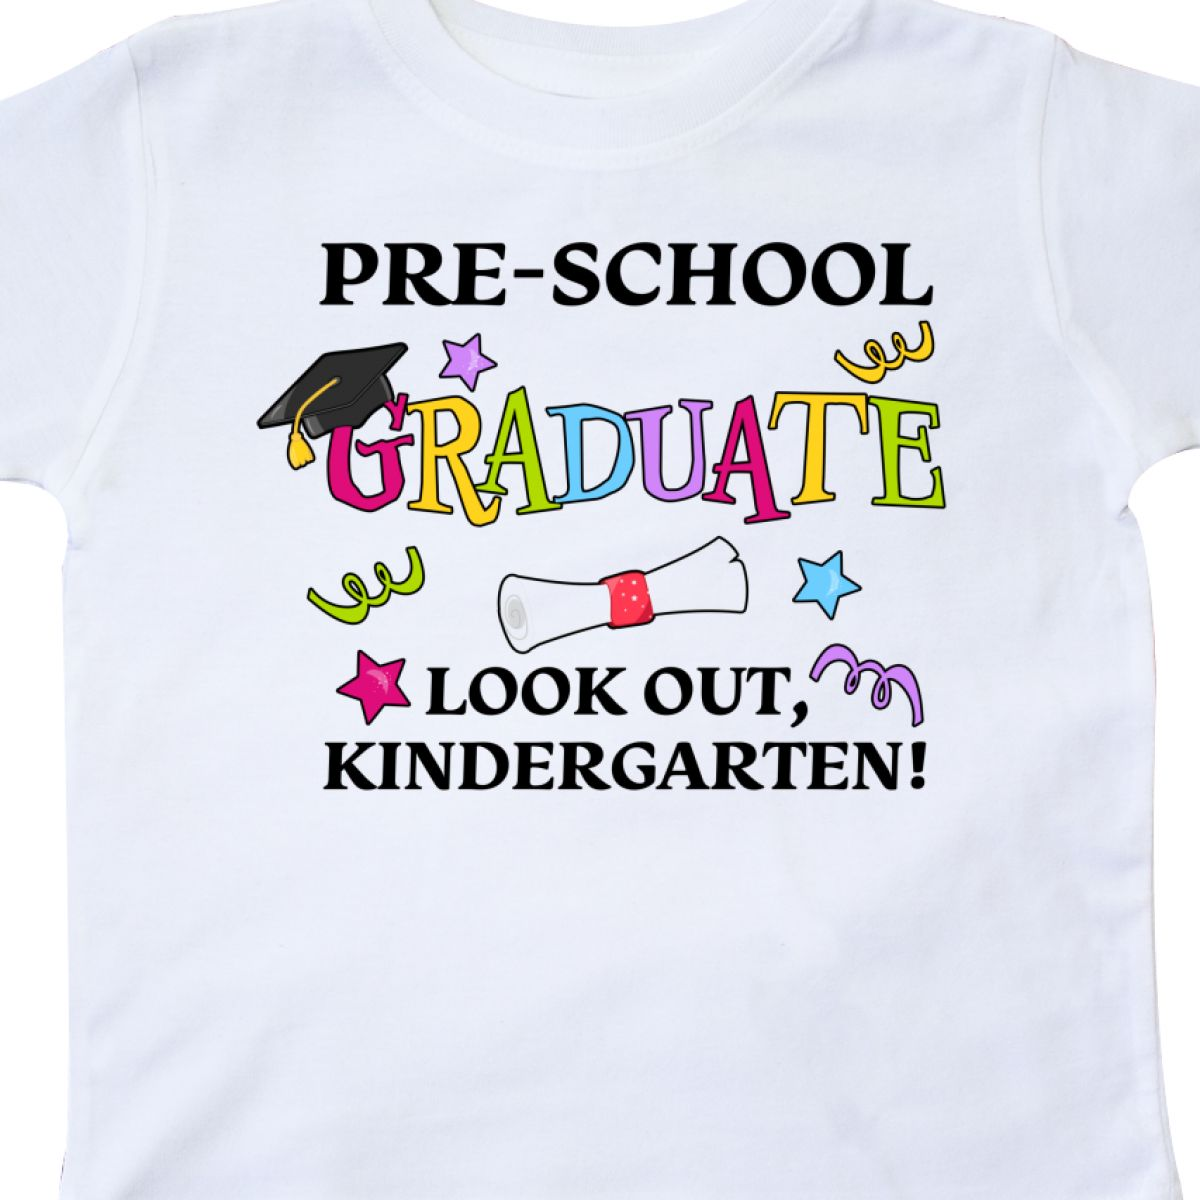 Inktastic-Pre-School-Graduate-Look-Out-Kindergarten-Toddler-T-Shirt-Graduation thumbnail 12